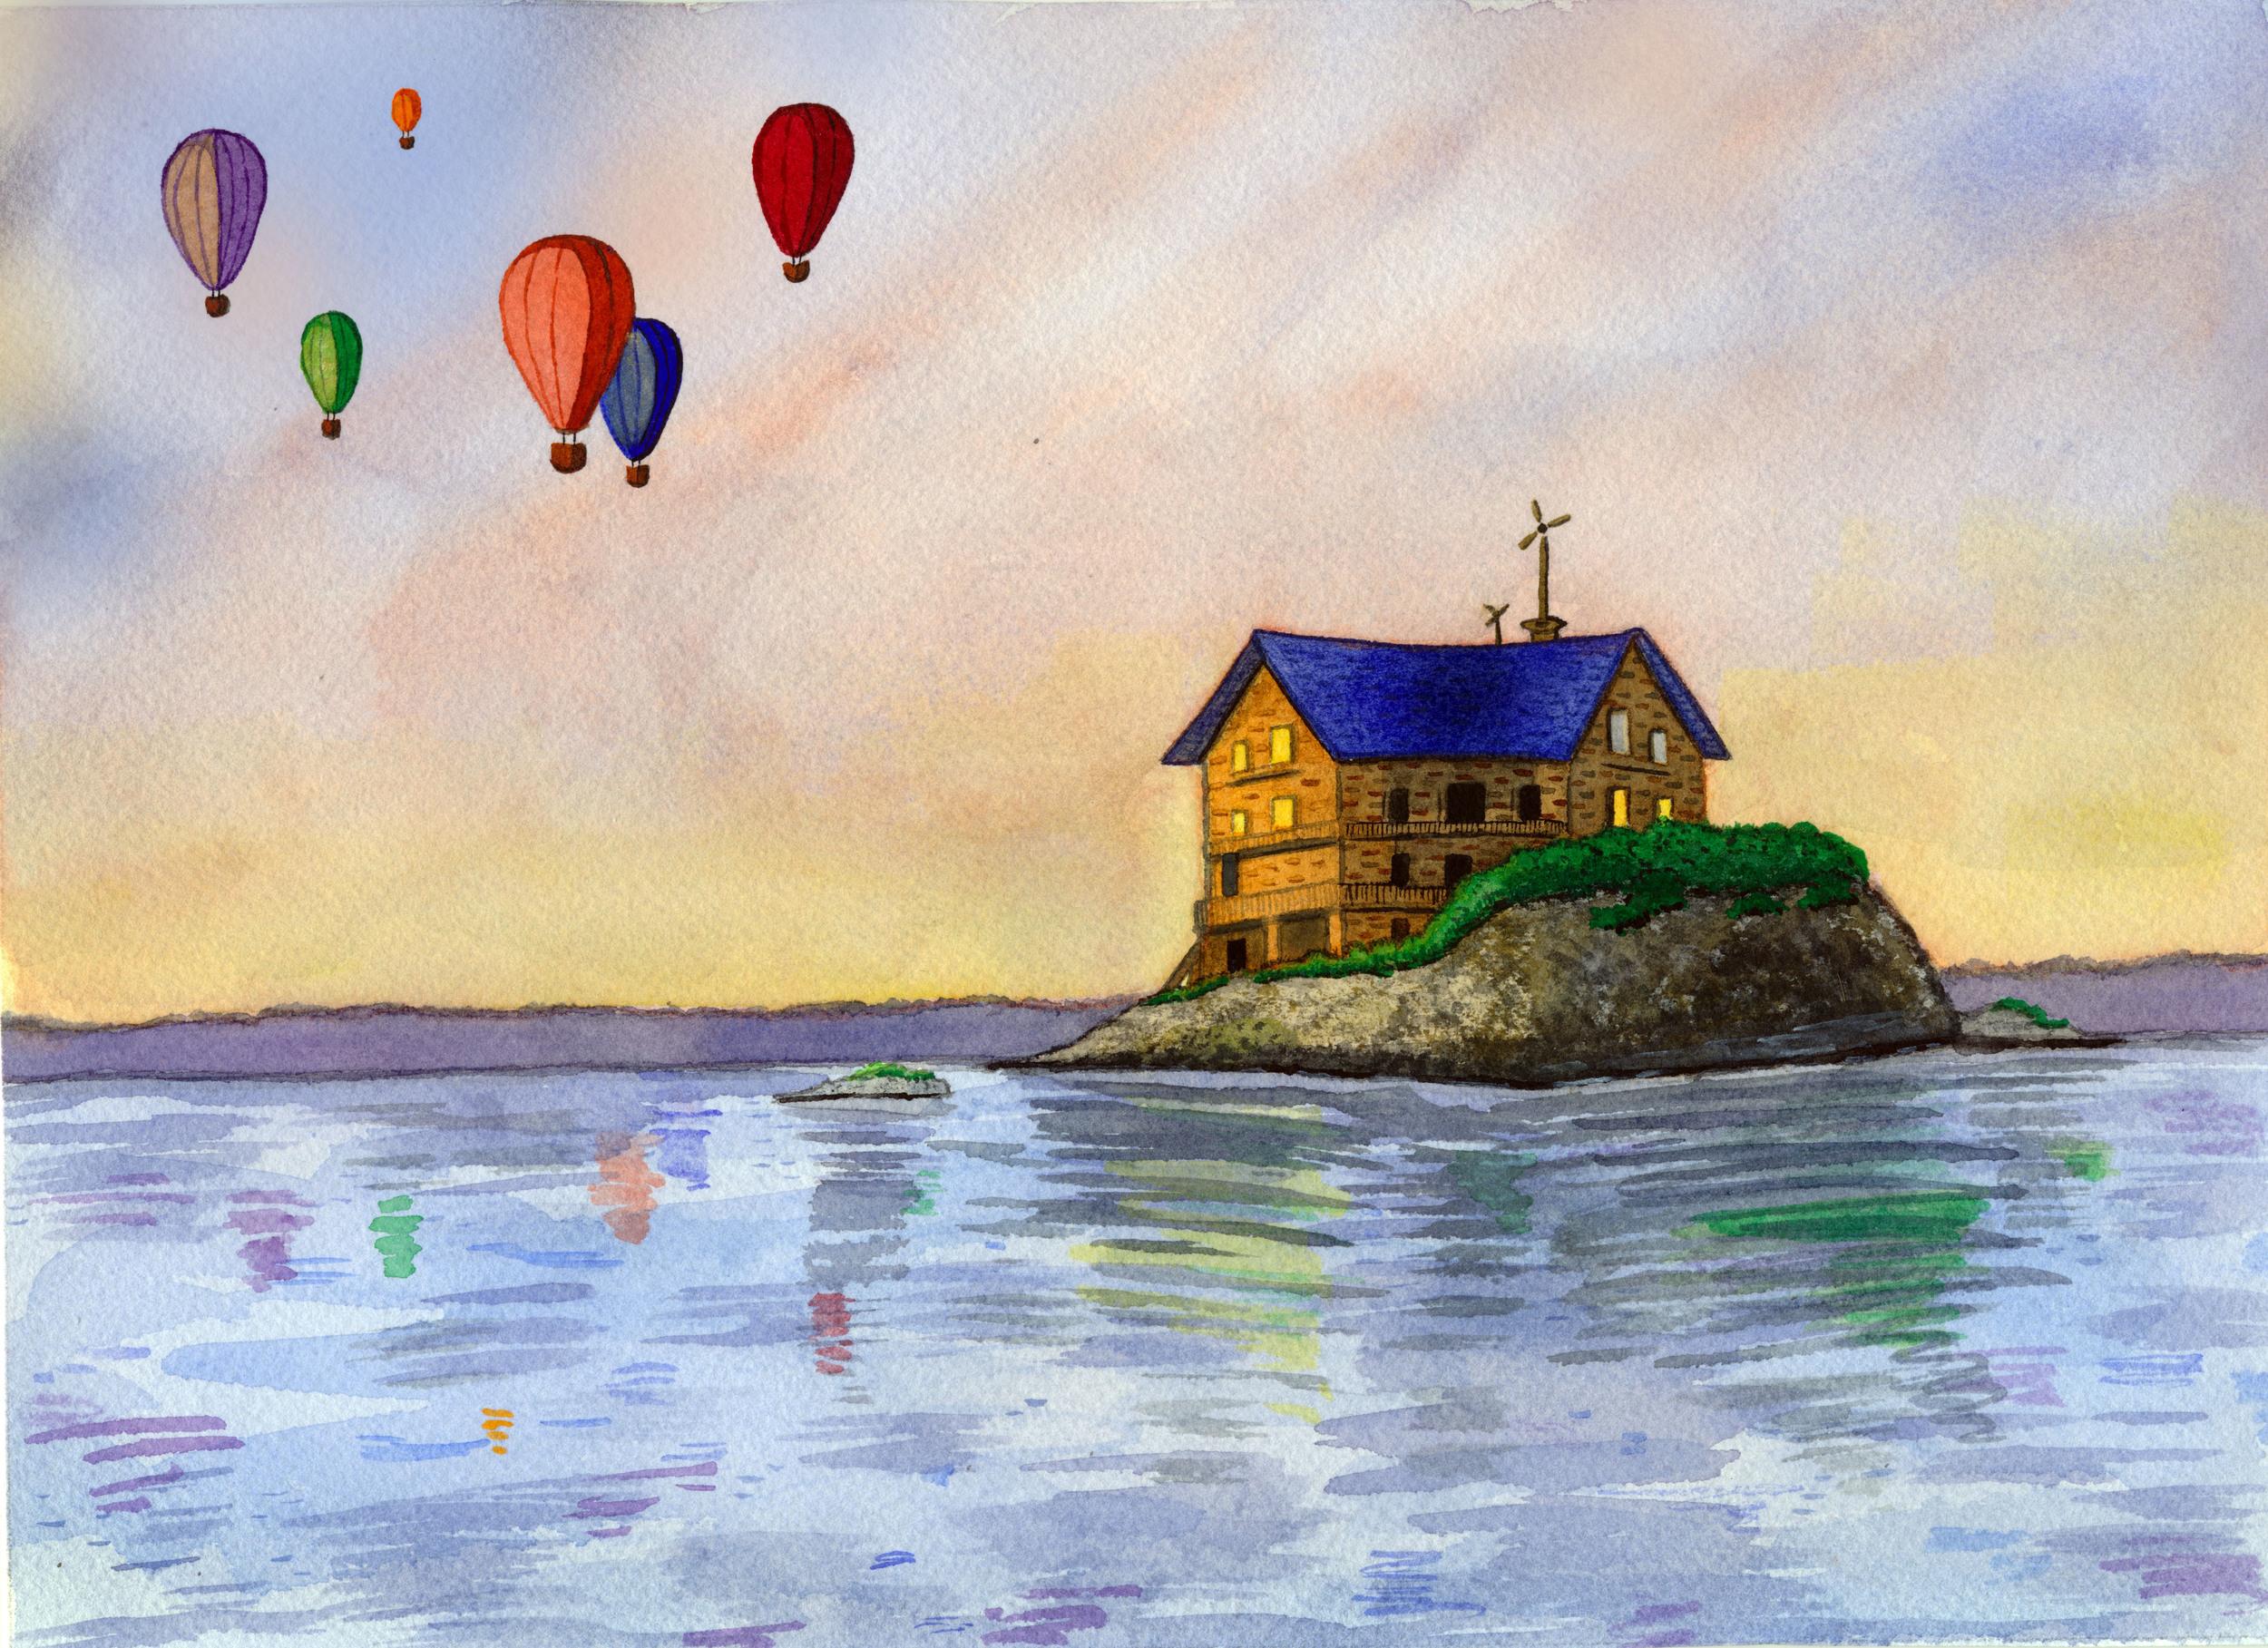 island_house2.jpg